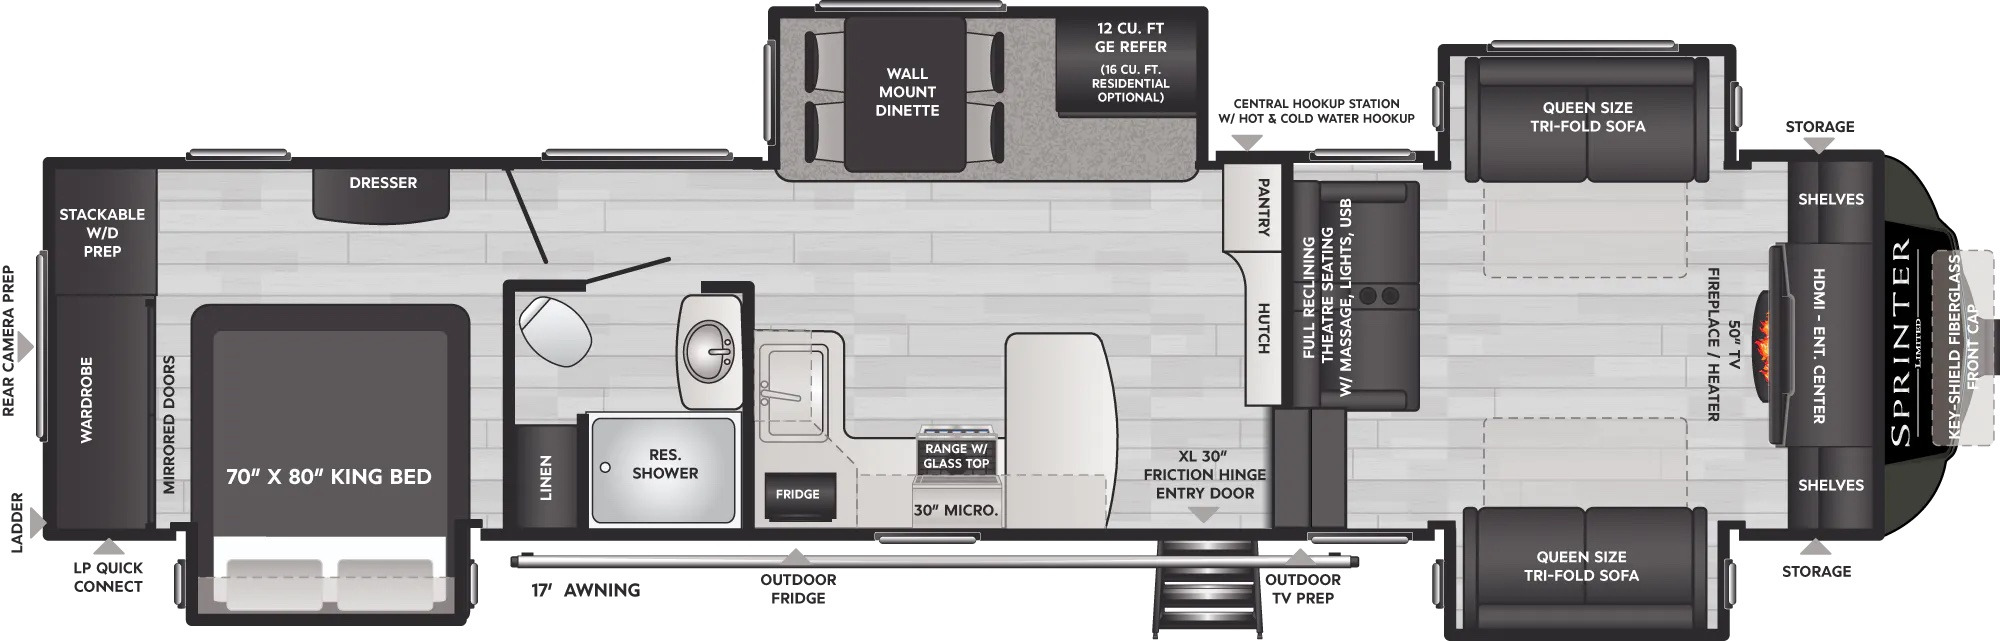 View Floor Plan for 2022 KEYSTONE SPRINTER LIMITED 3670FLS